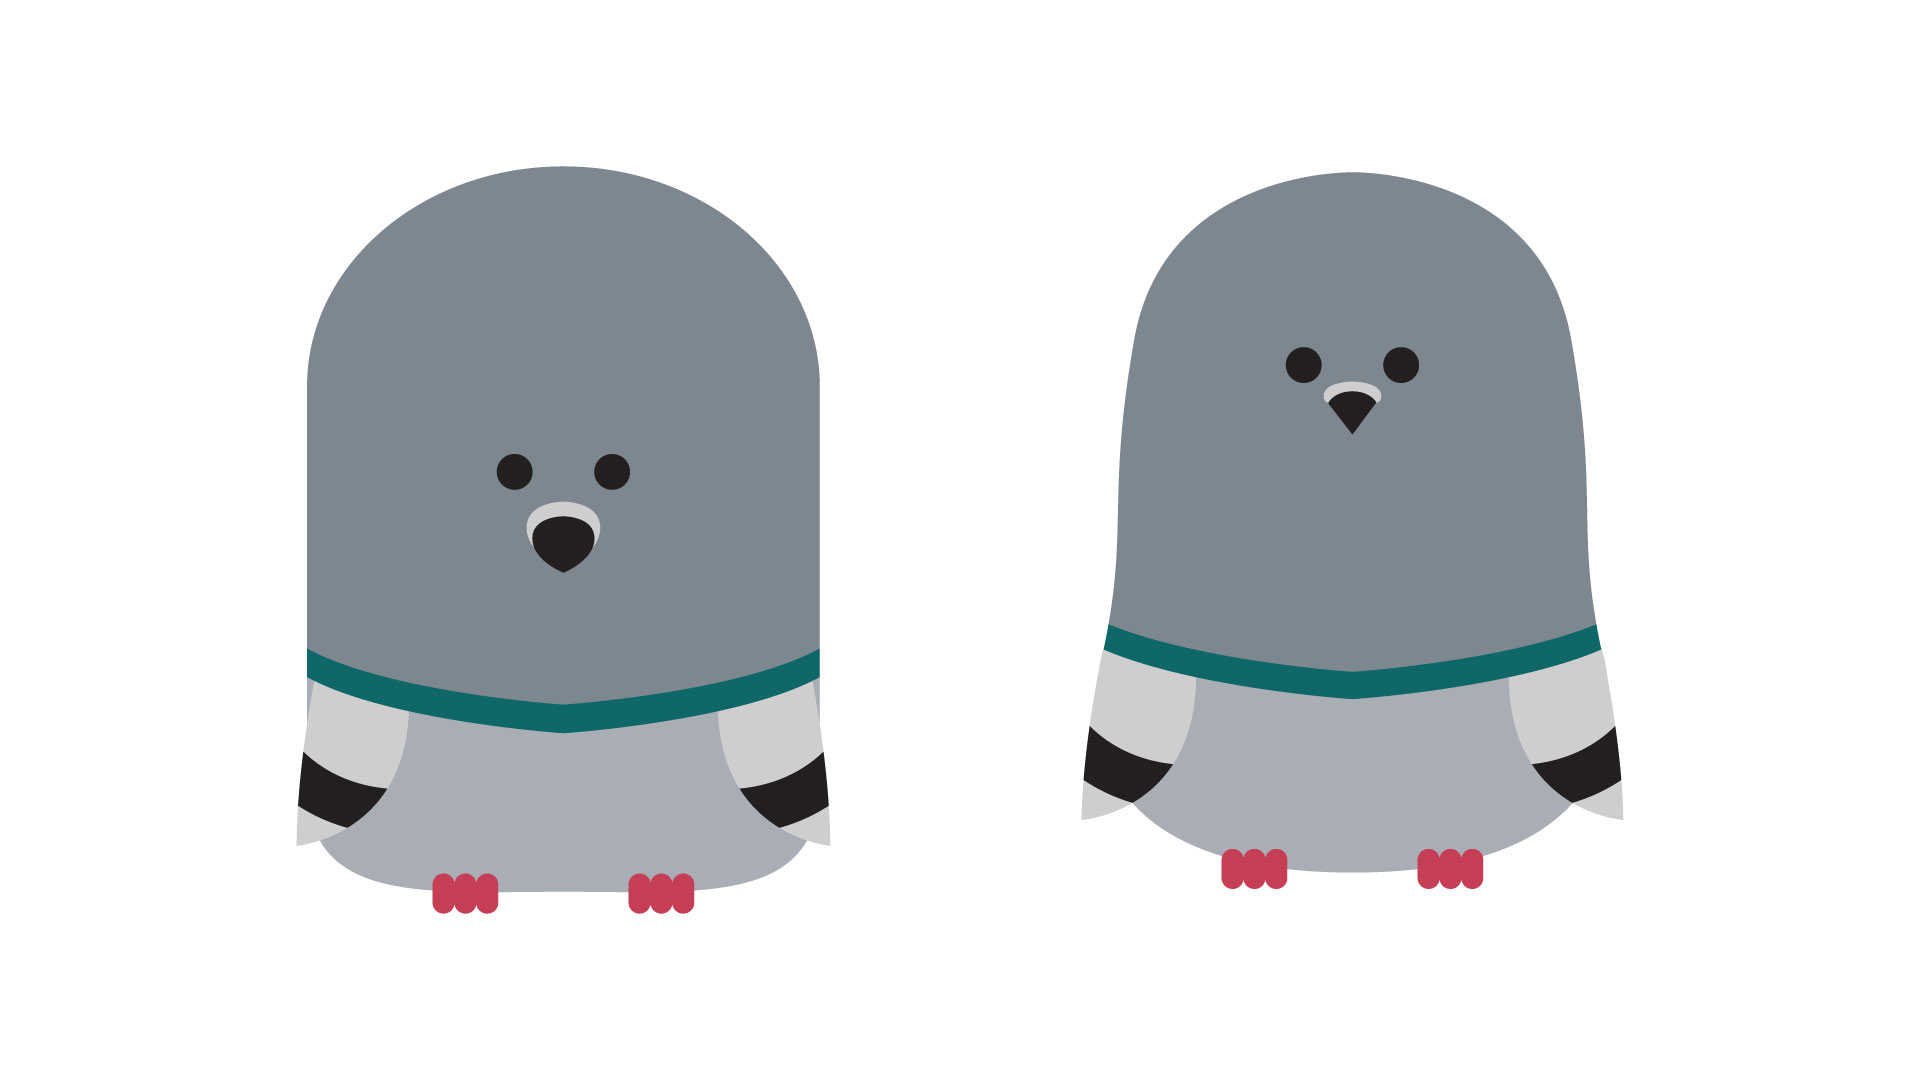 cio-mascot-014.jpg